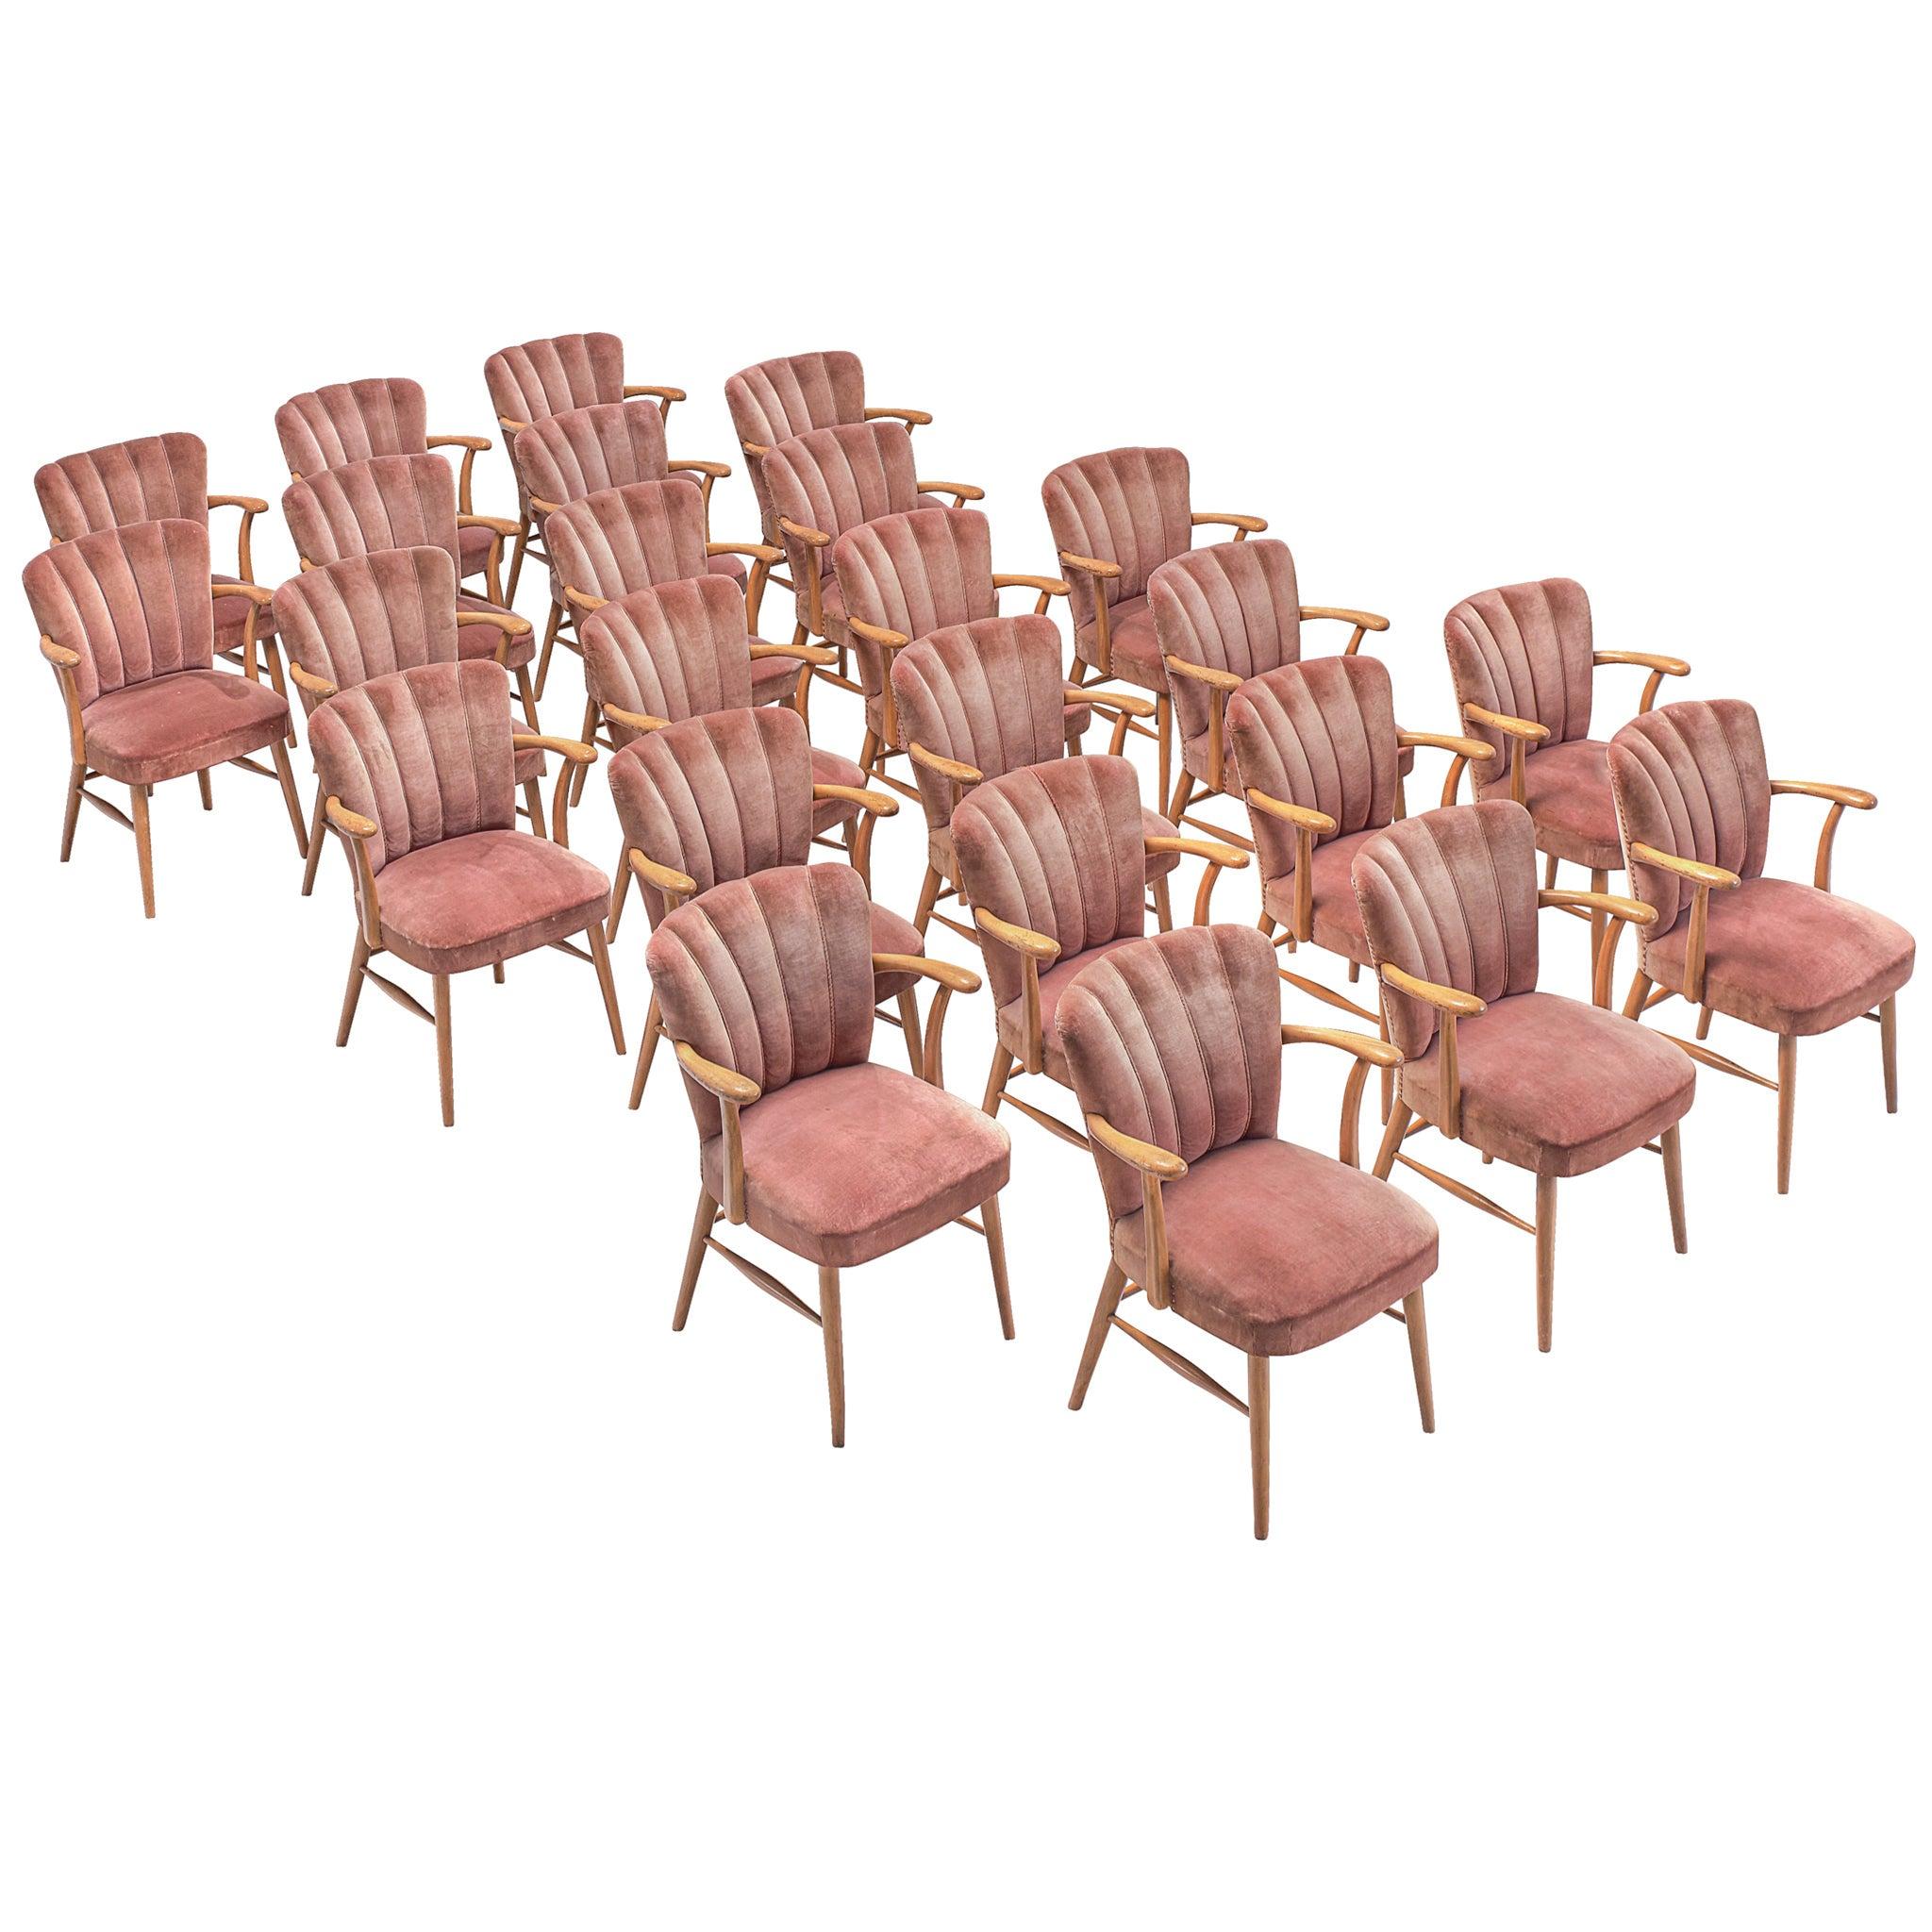 Large Set of Twenty-Four Armchairs in Soft Rose Velvet